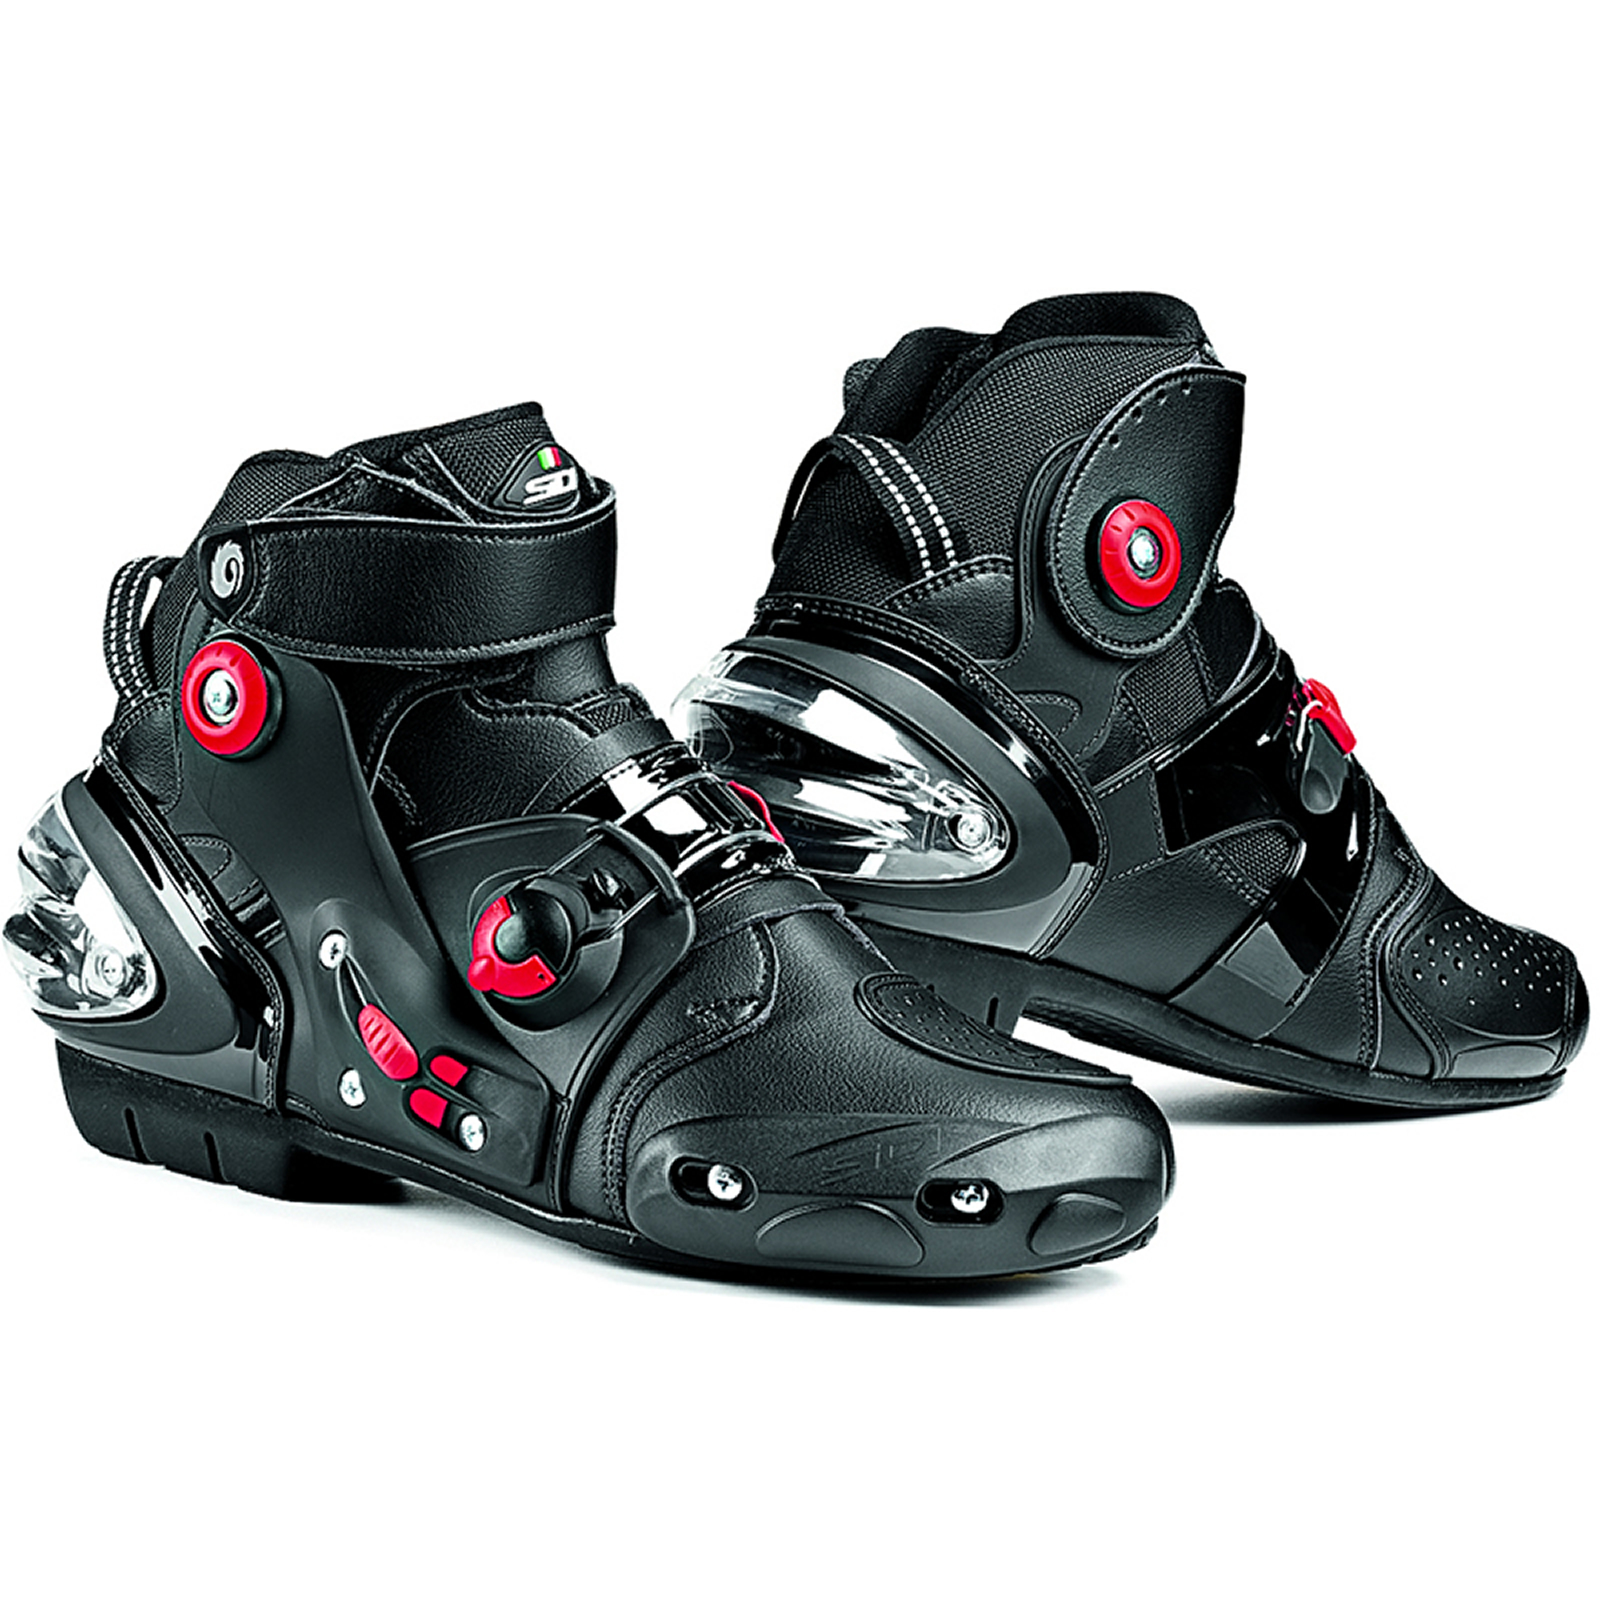 Sidi Womens Motorcycle Shoes